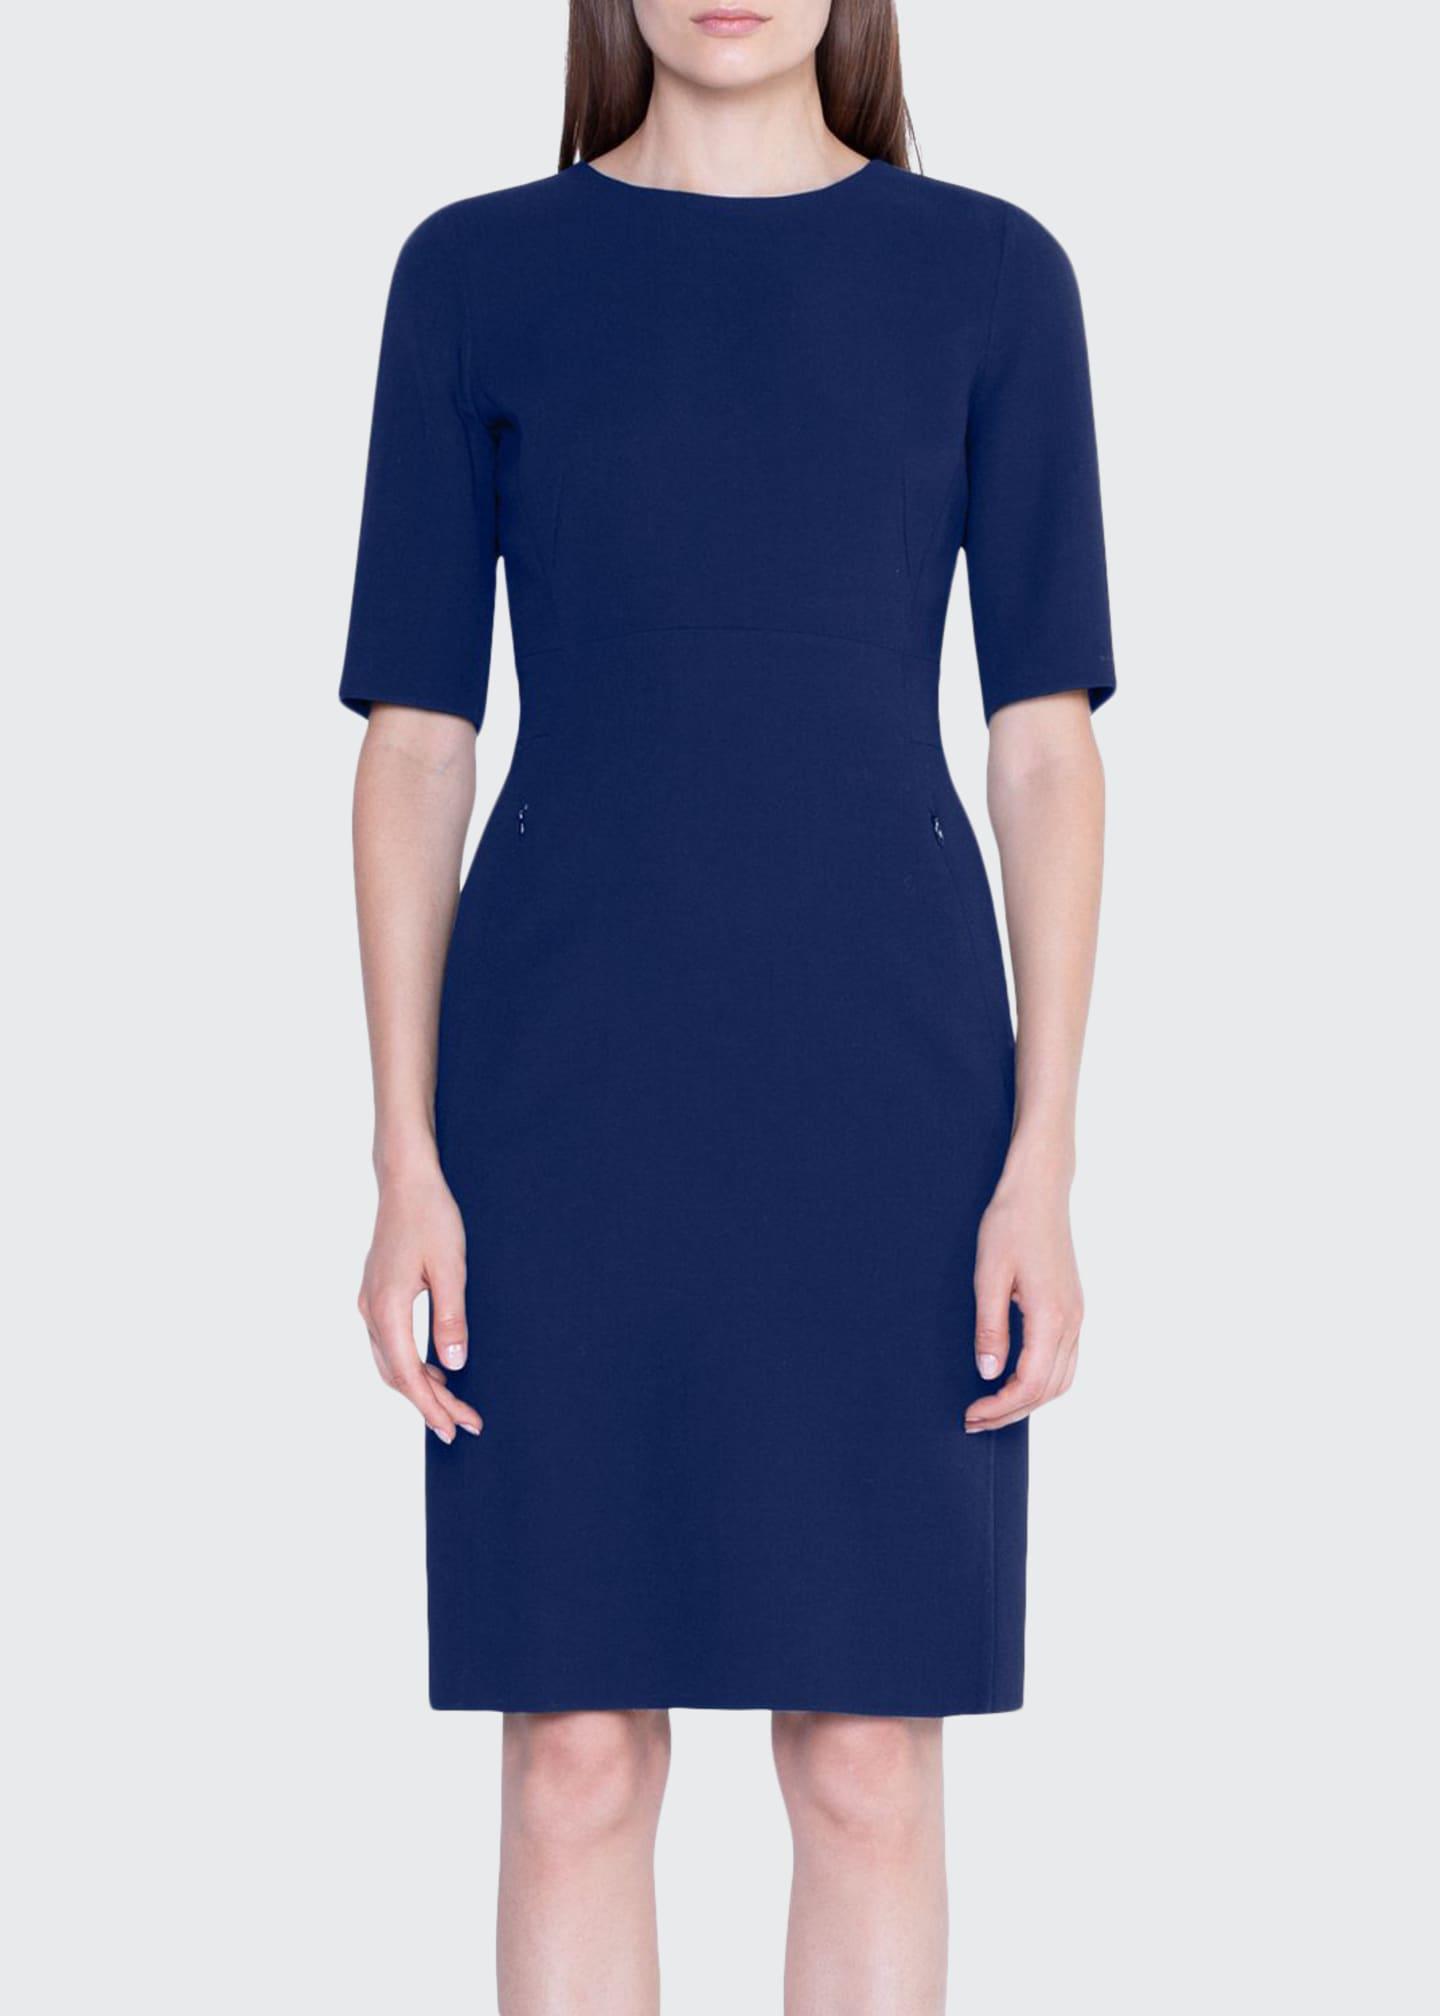 Akris Double-Face Wool Half-Sleeve Dress